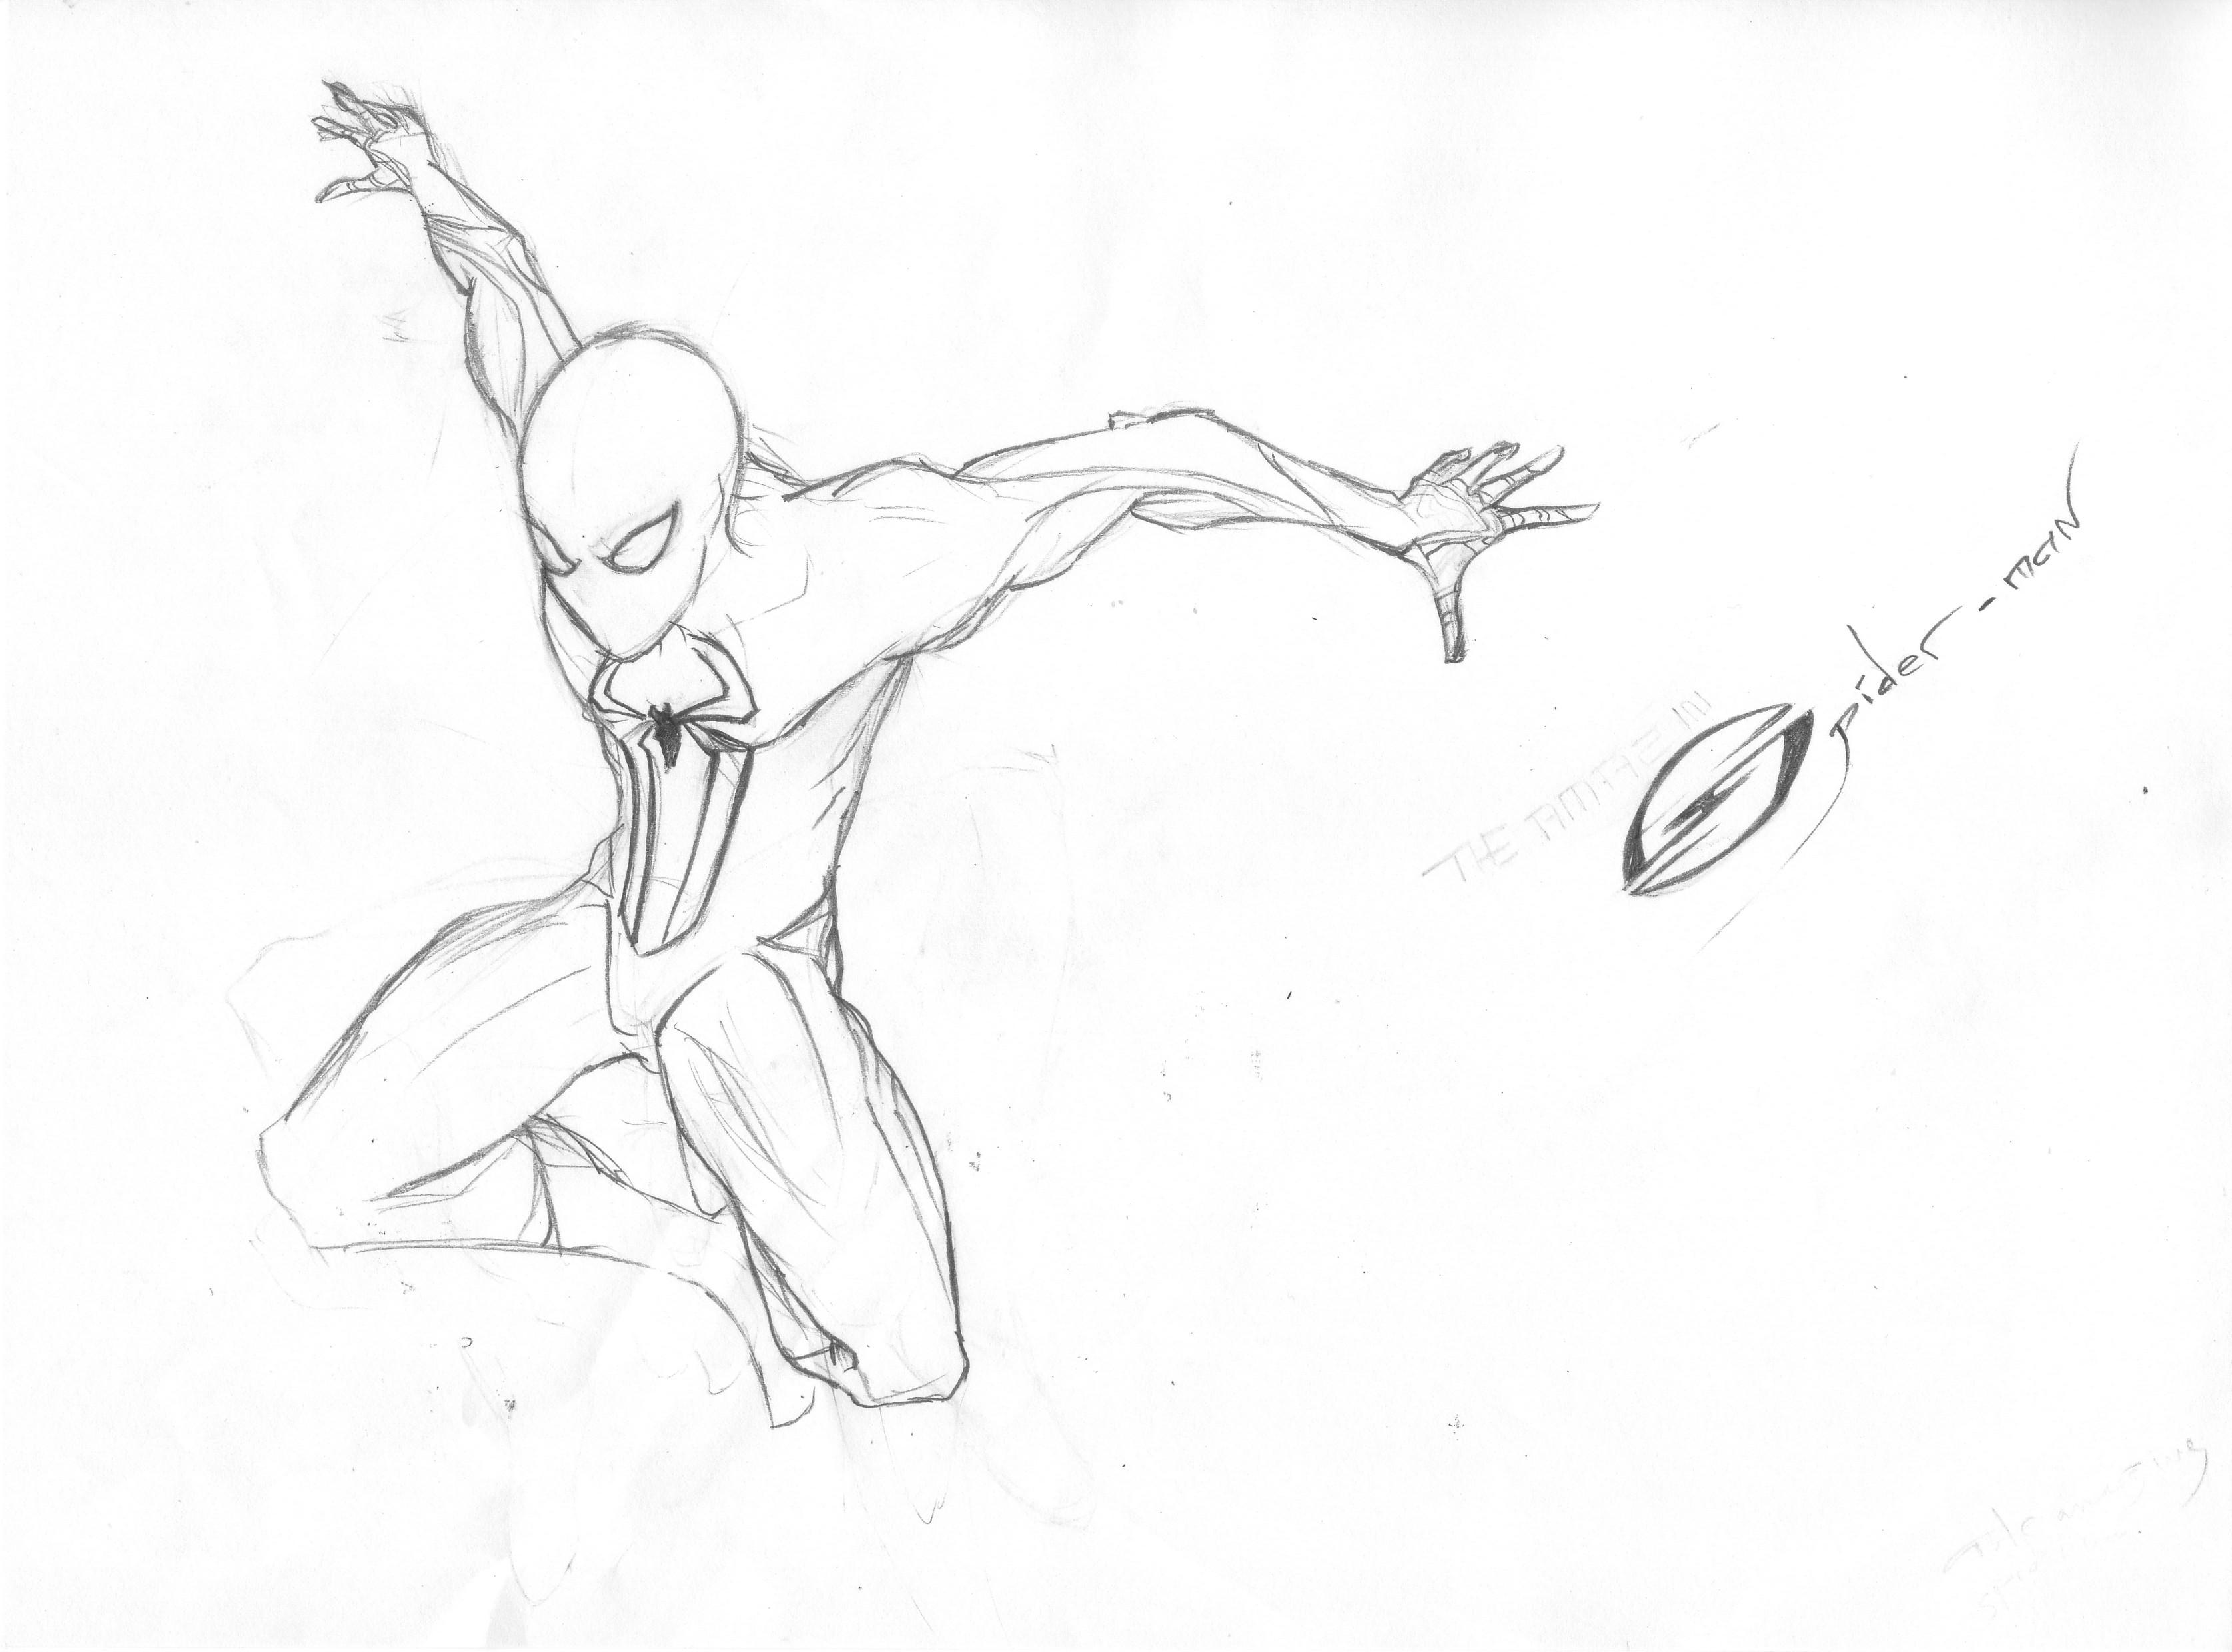 Impressionnant Dessin A Imprimer the Amazing Spider Man